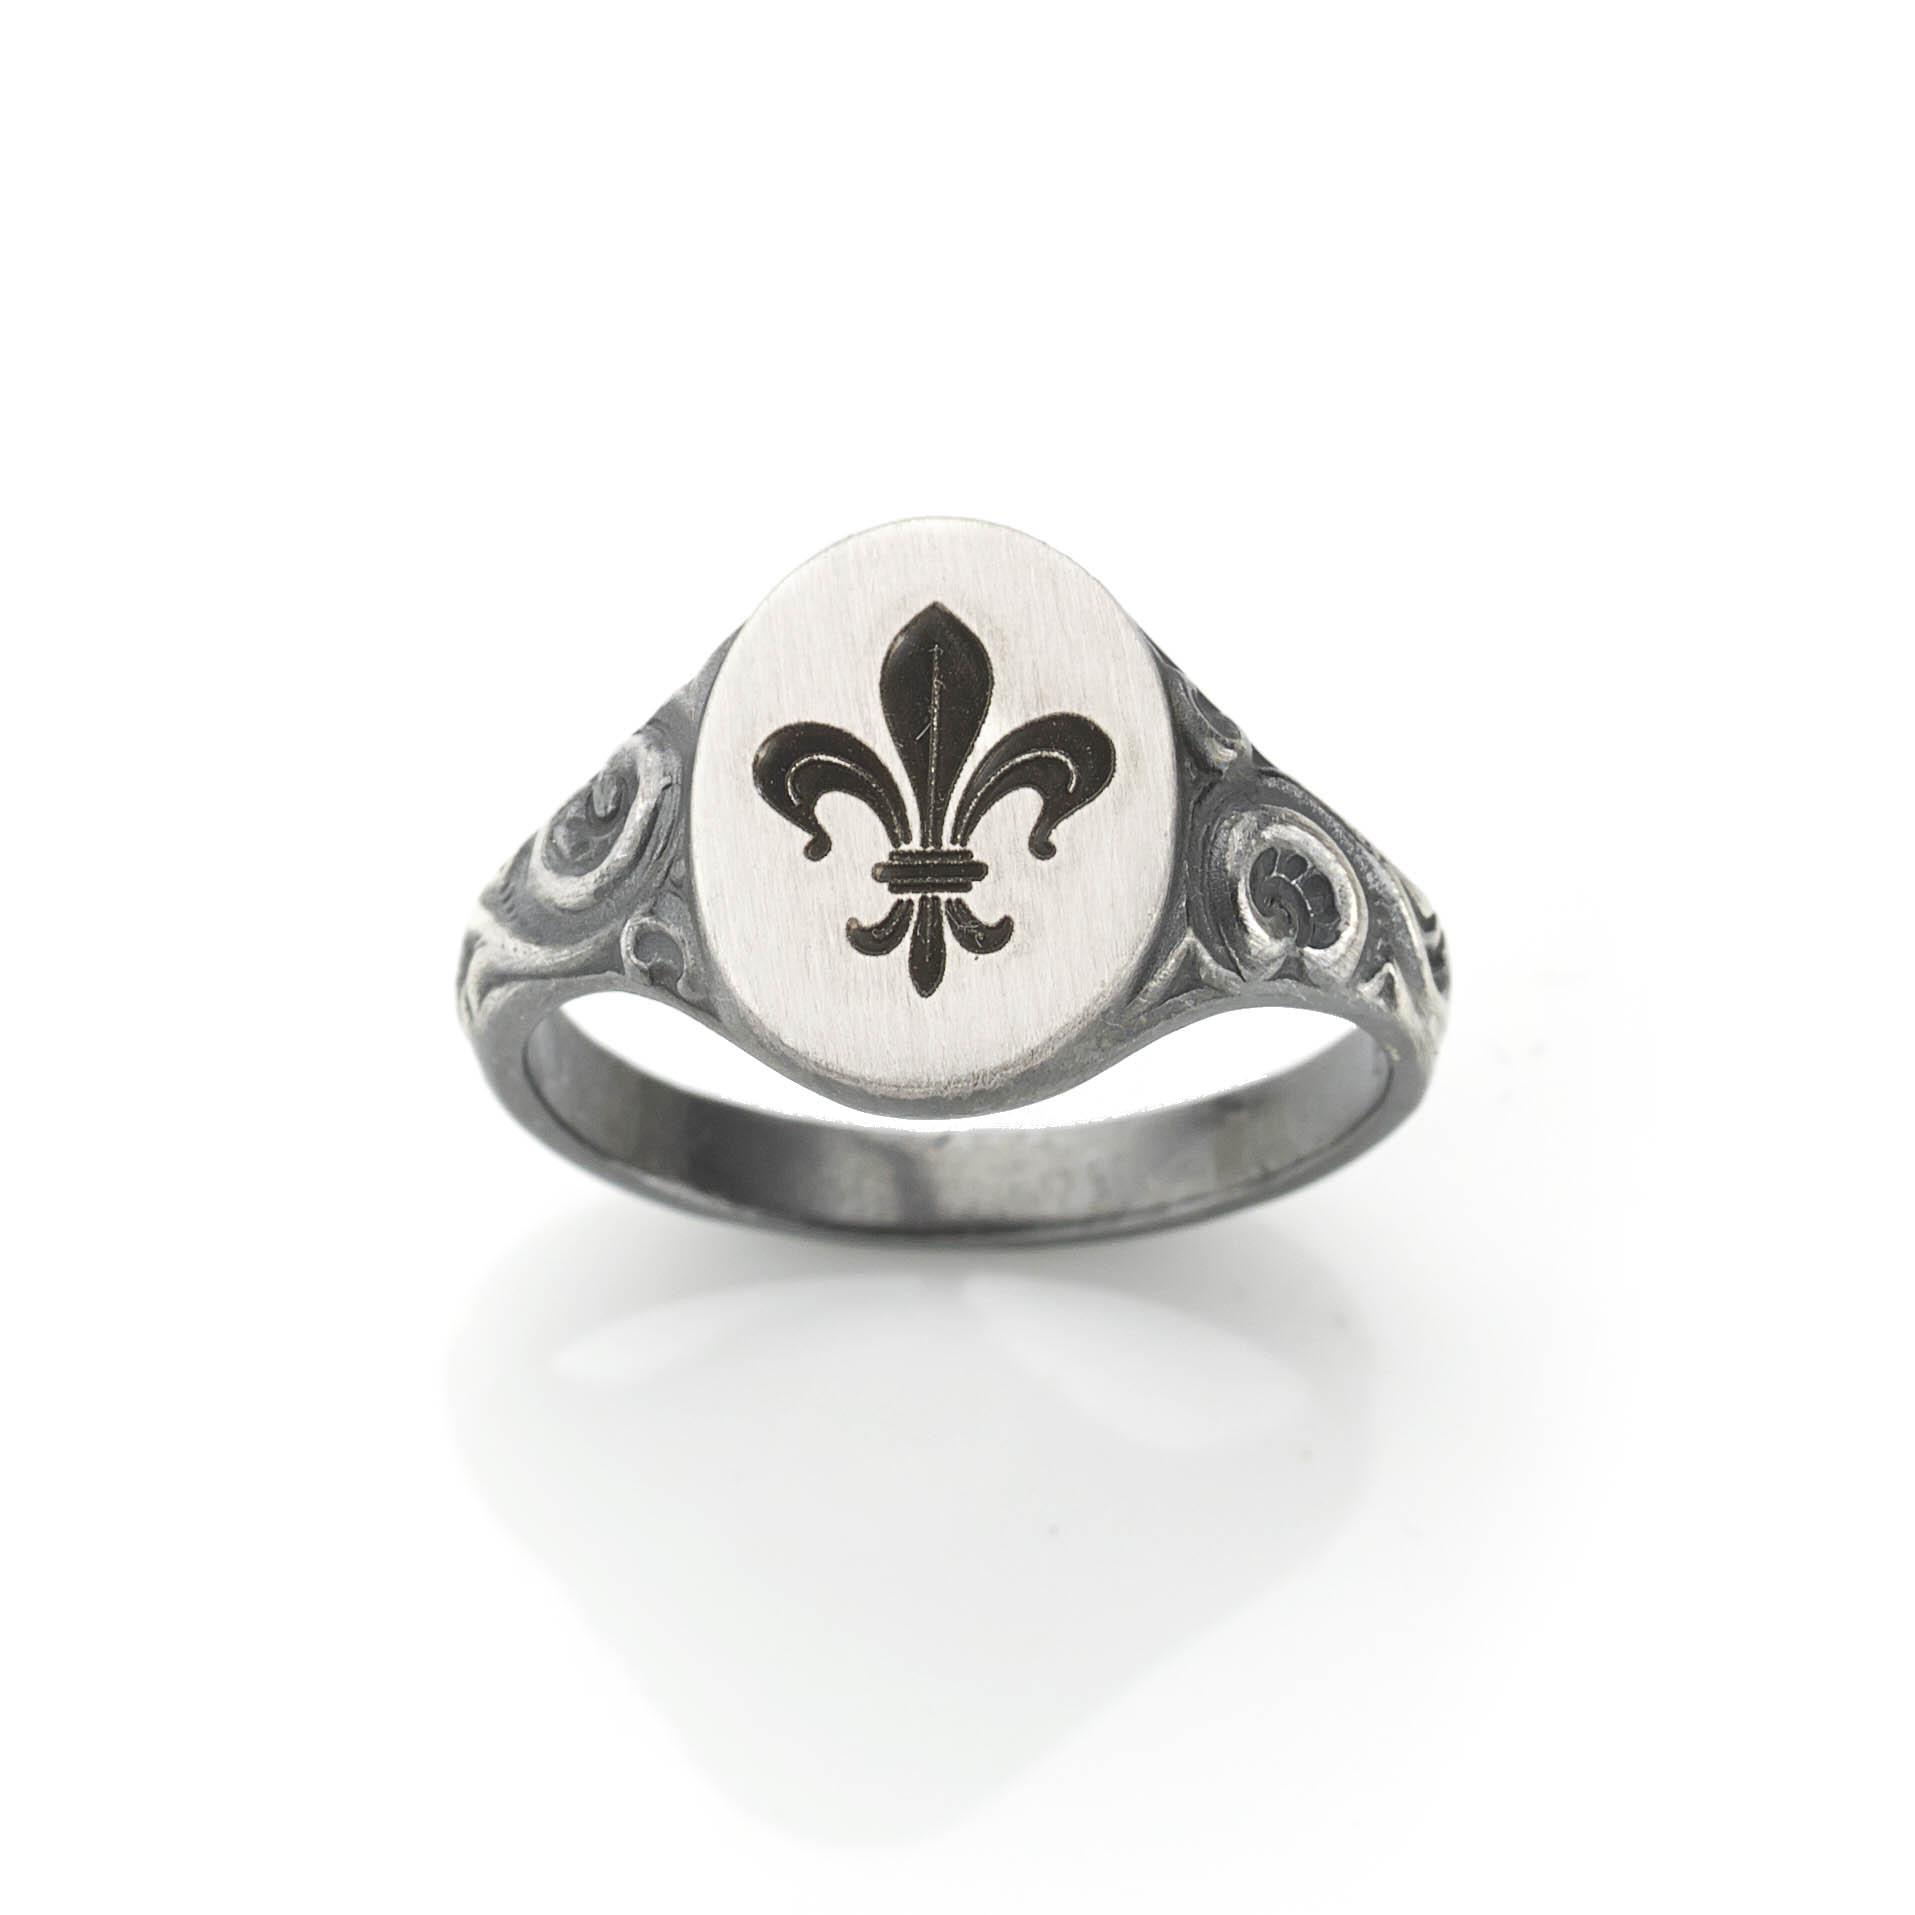 fleur-de-lys-silver-signet-ring — Jewellery Discovery